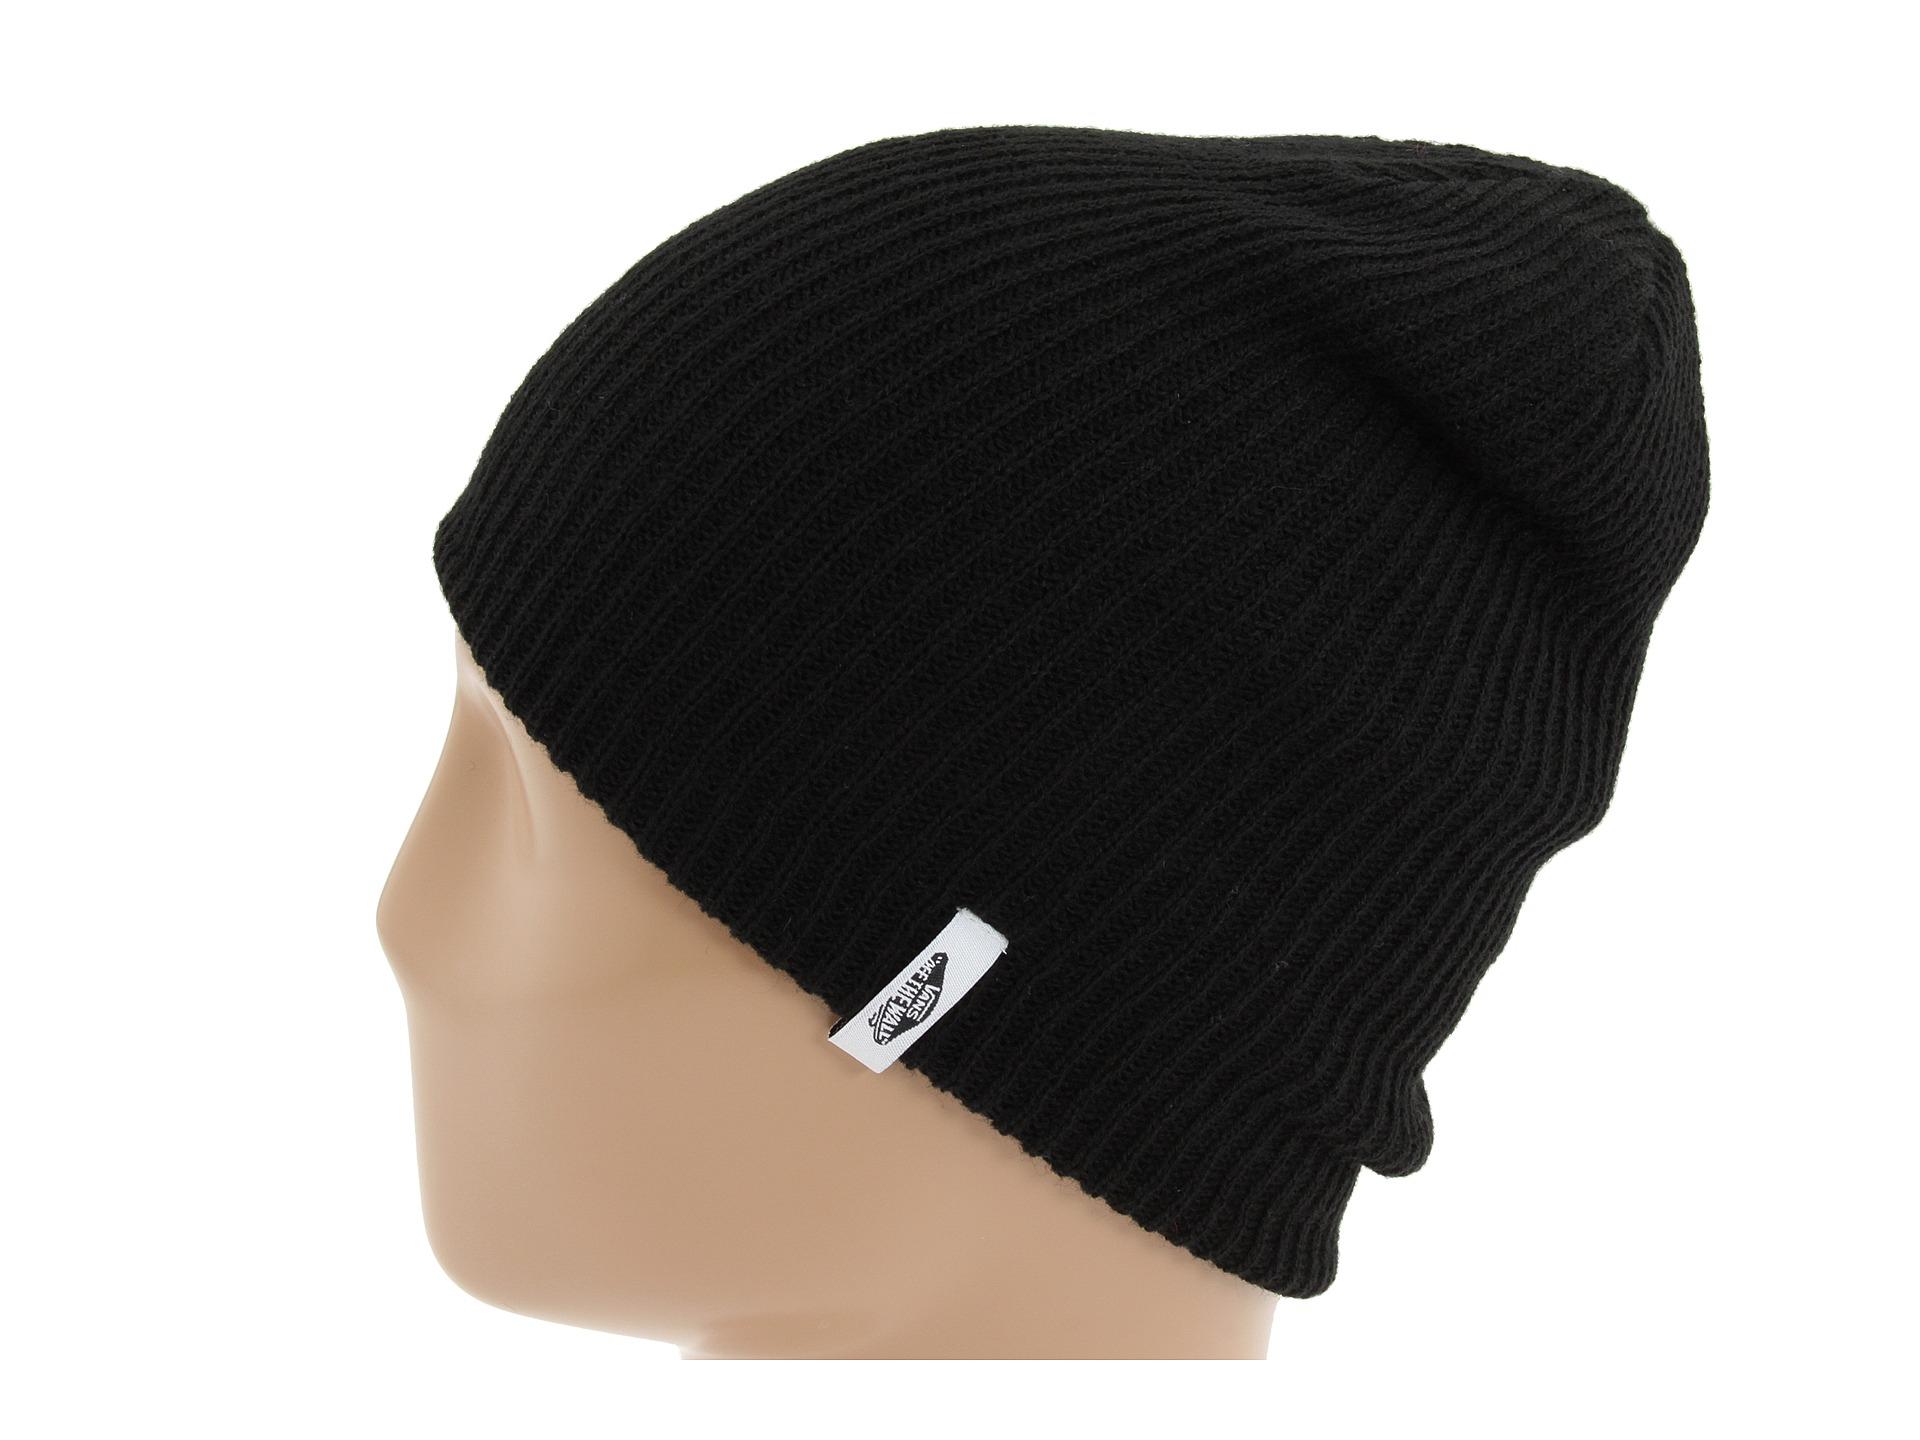 624308a7e53daa Lyst - Vans Mismoedig Beanie in Black for Men